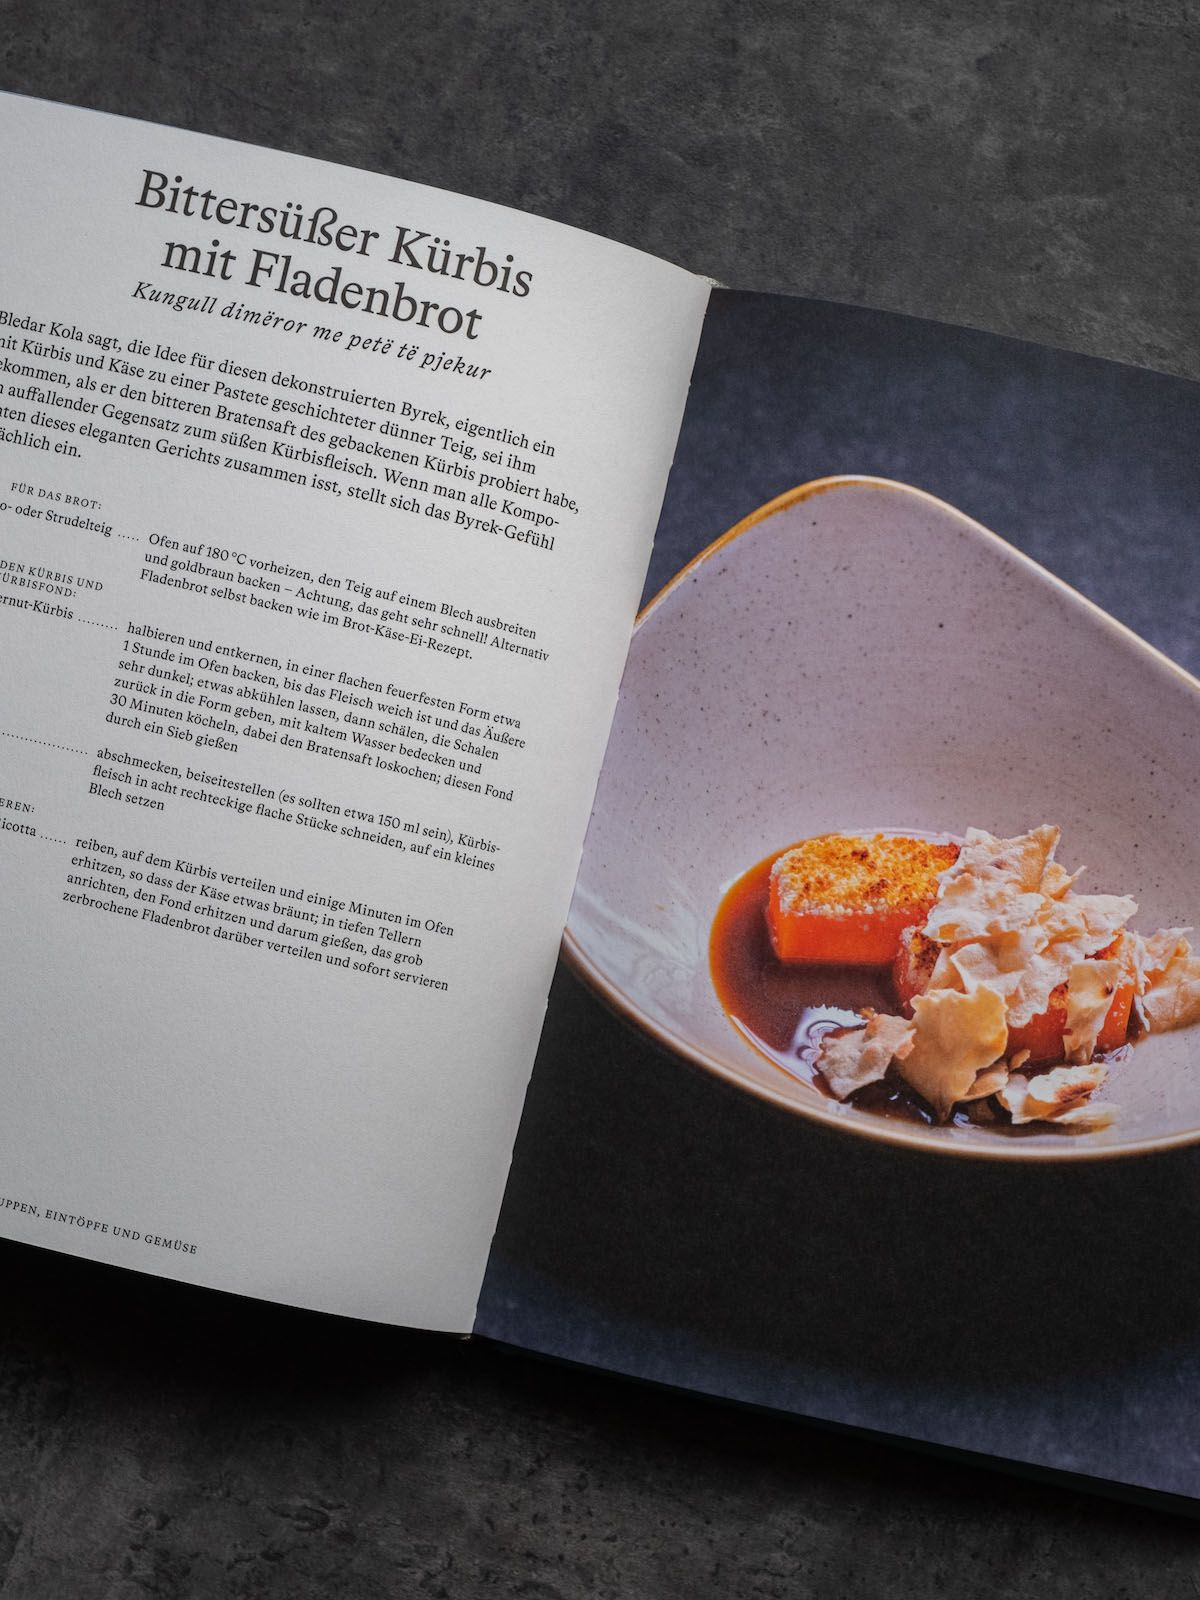 Leckerbissen About Fuel Foodblog Bledar Kola Kochbuch, Dessert, Kürbis